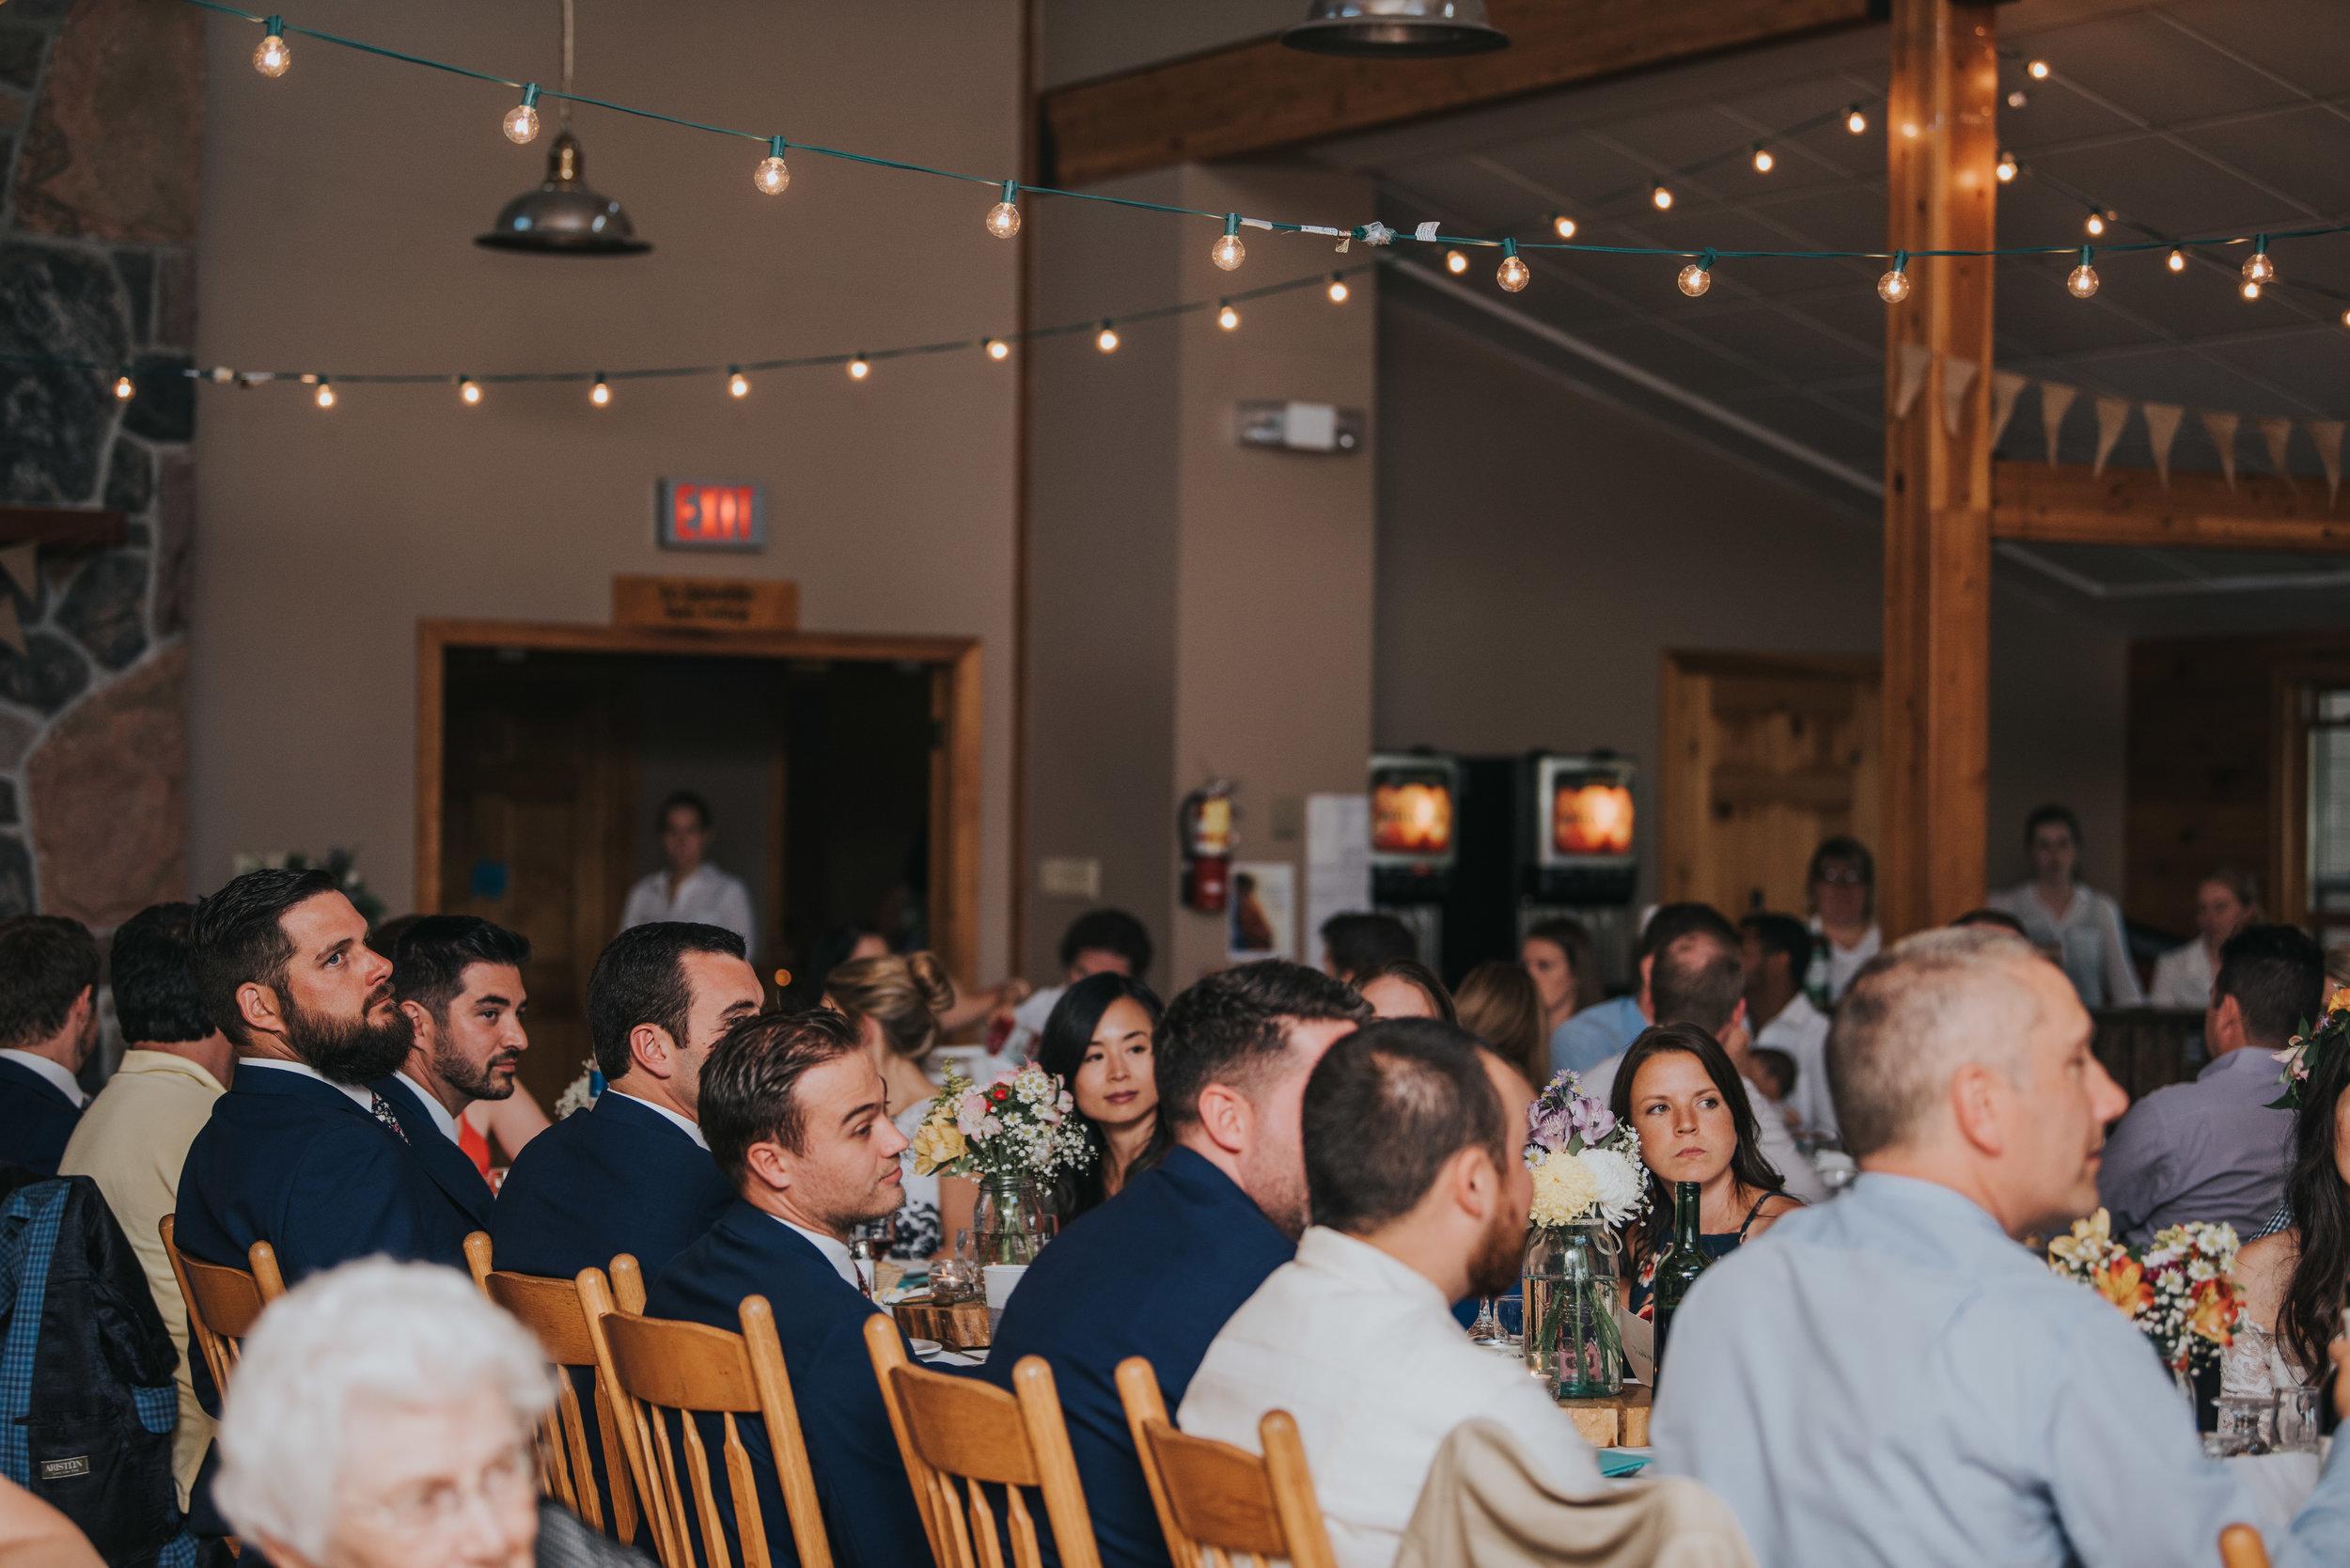 rustic-cabin-wedding-reception-venue-toronto-bohemian-boho-outdoor-summer-wedding-documentary-wedding-photography-by-willow-birch-photo.jpg